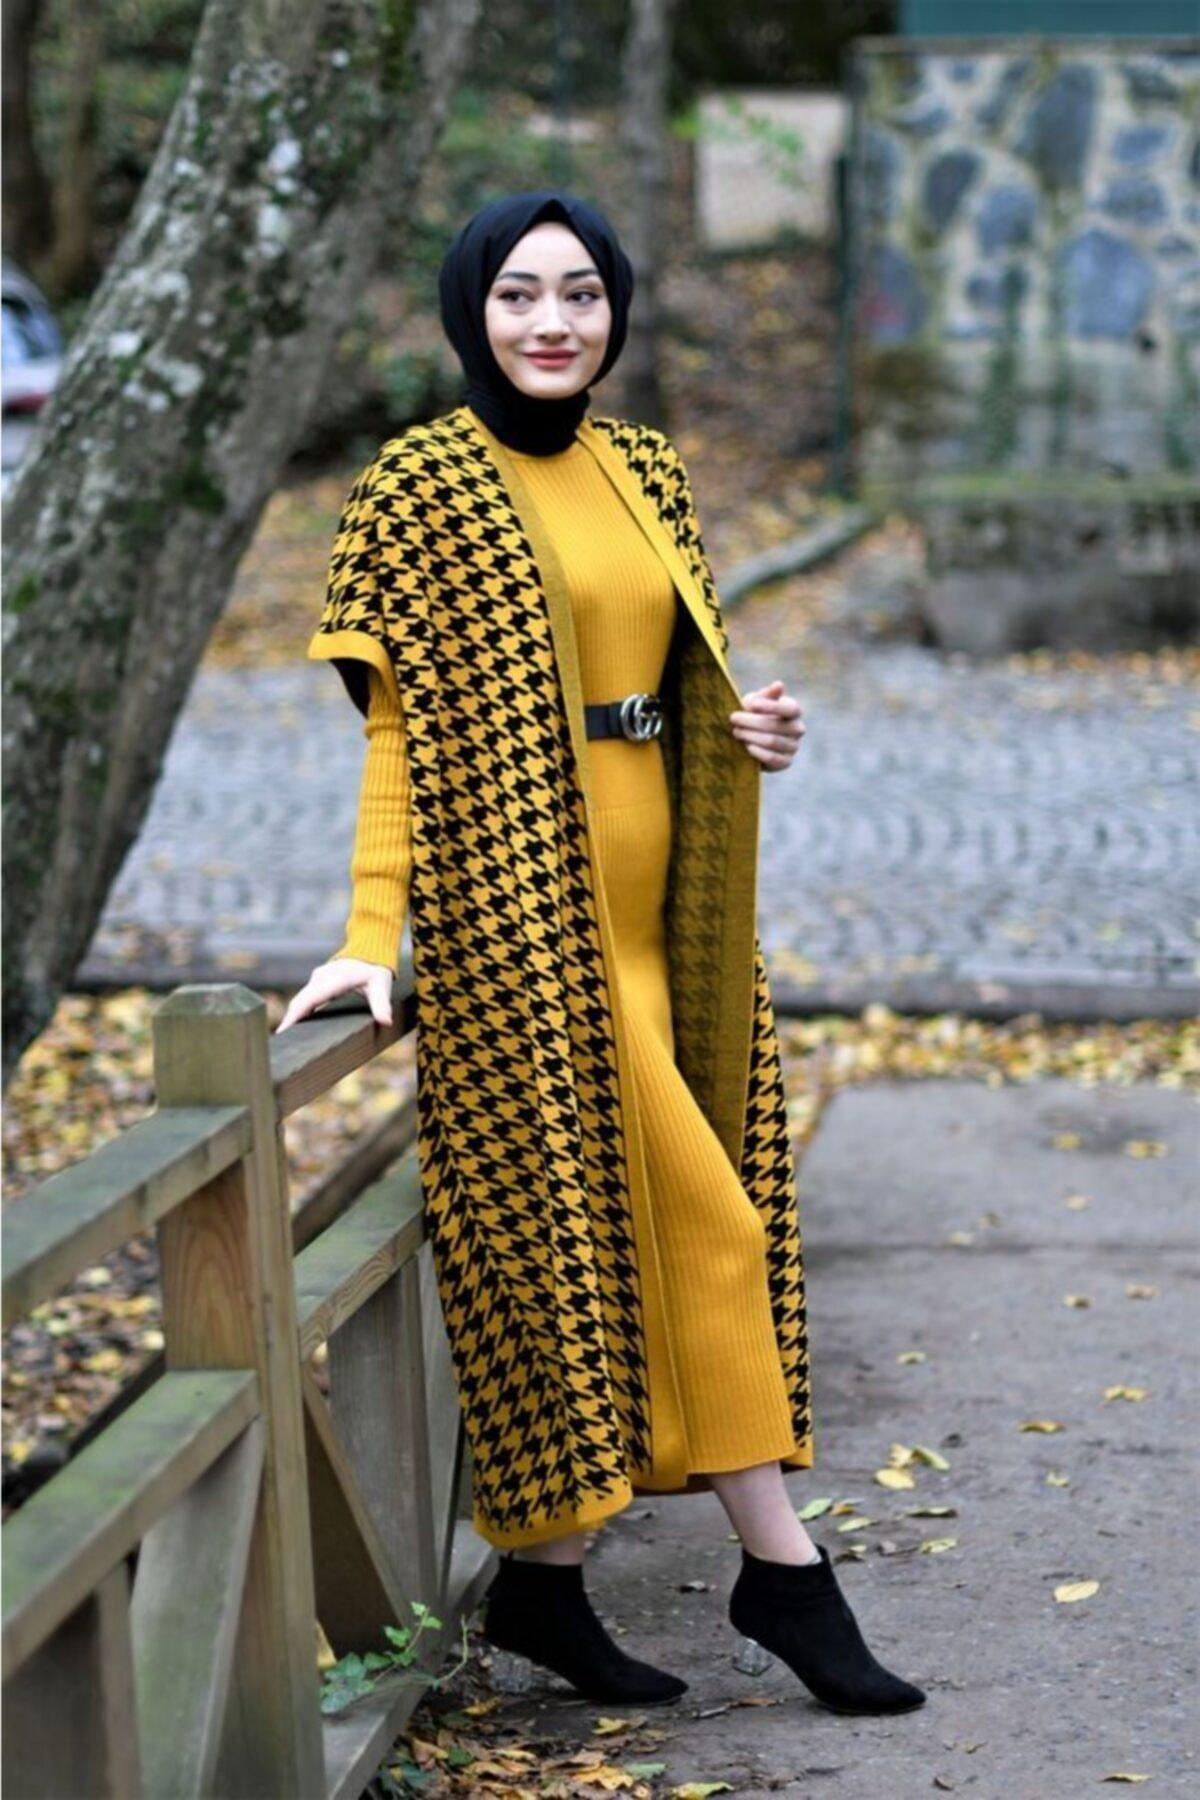 Kaftan Abaya Turkey Muslim Fashion Hijab Dress Islam Caftan Abayas For Women Muslim Hijab Dress 2021